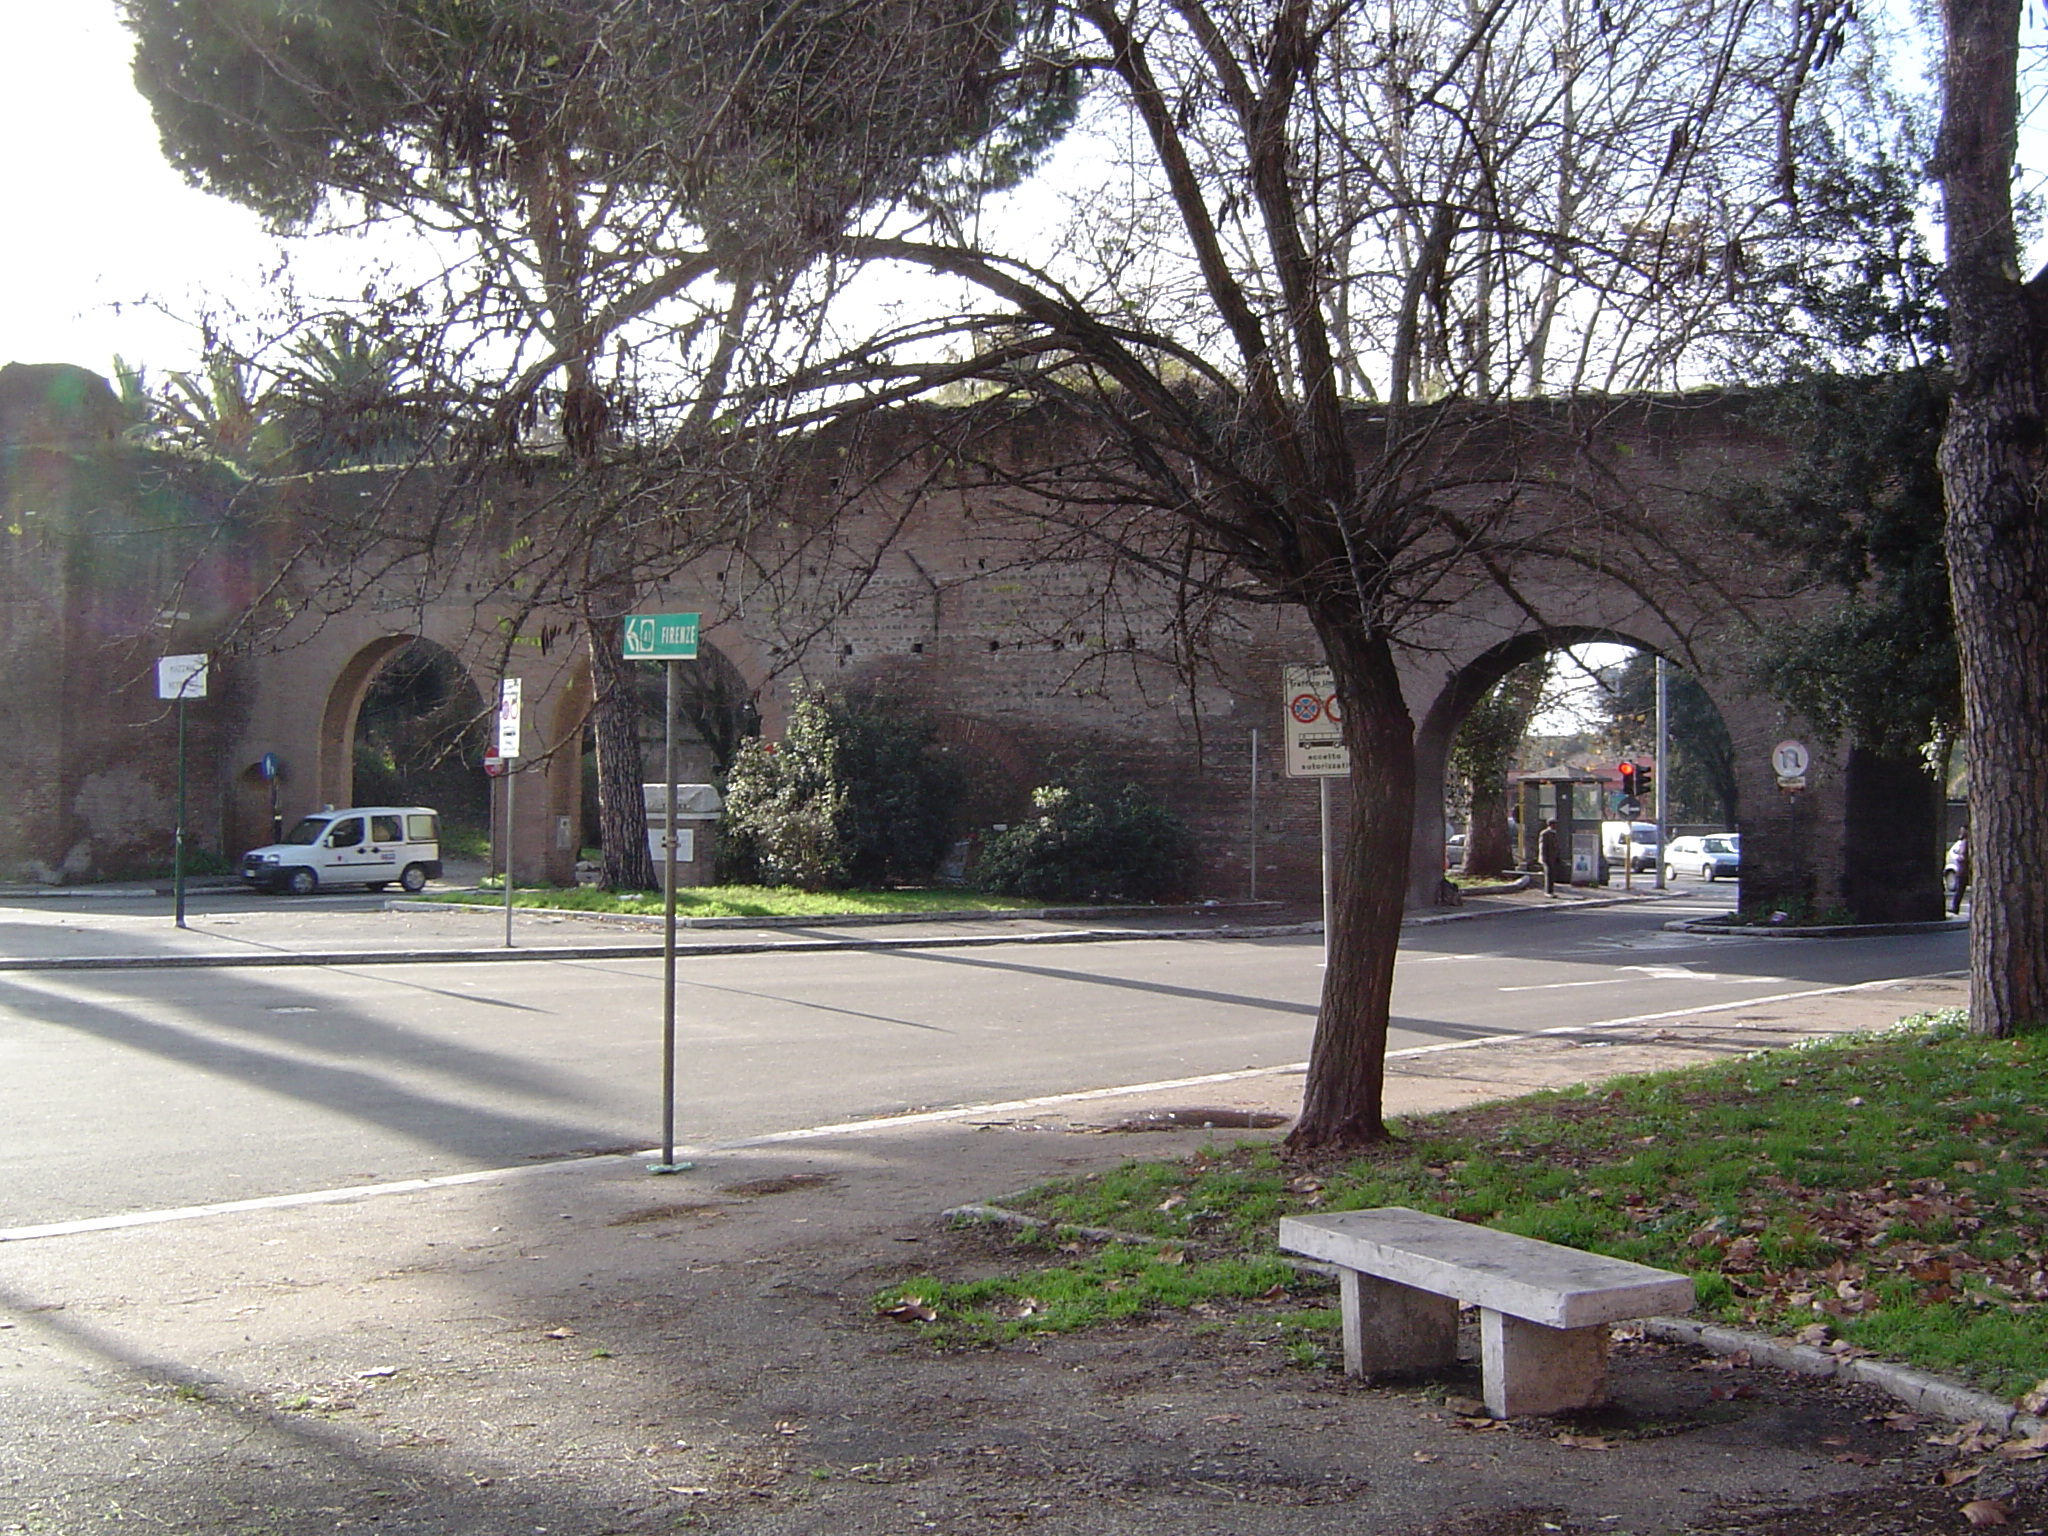 Puerta Metronia